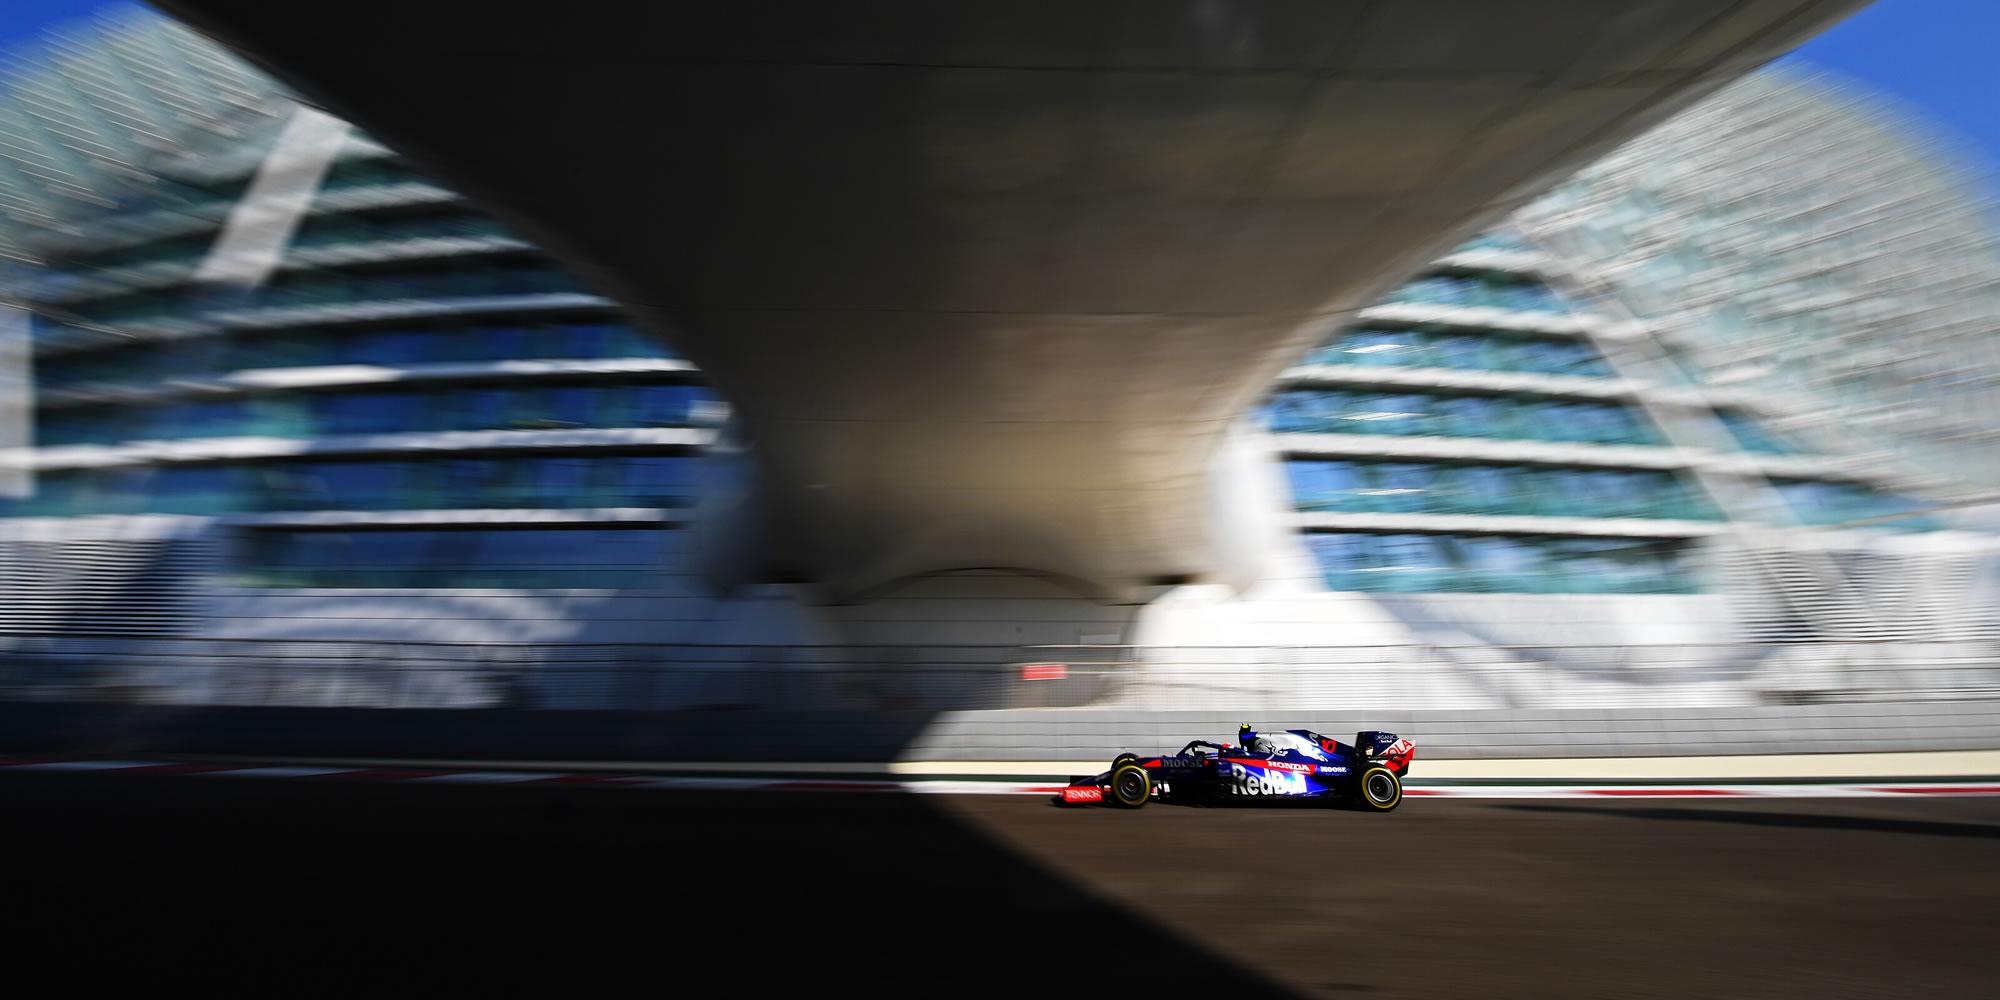 GP Abu Dhabi 2019 – Gallery 12